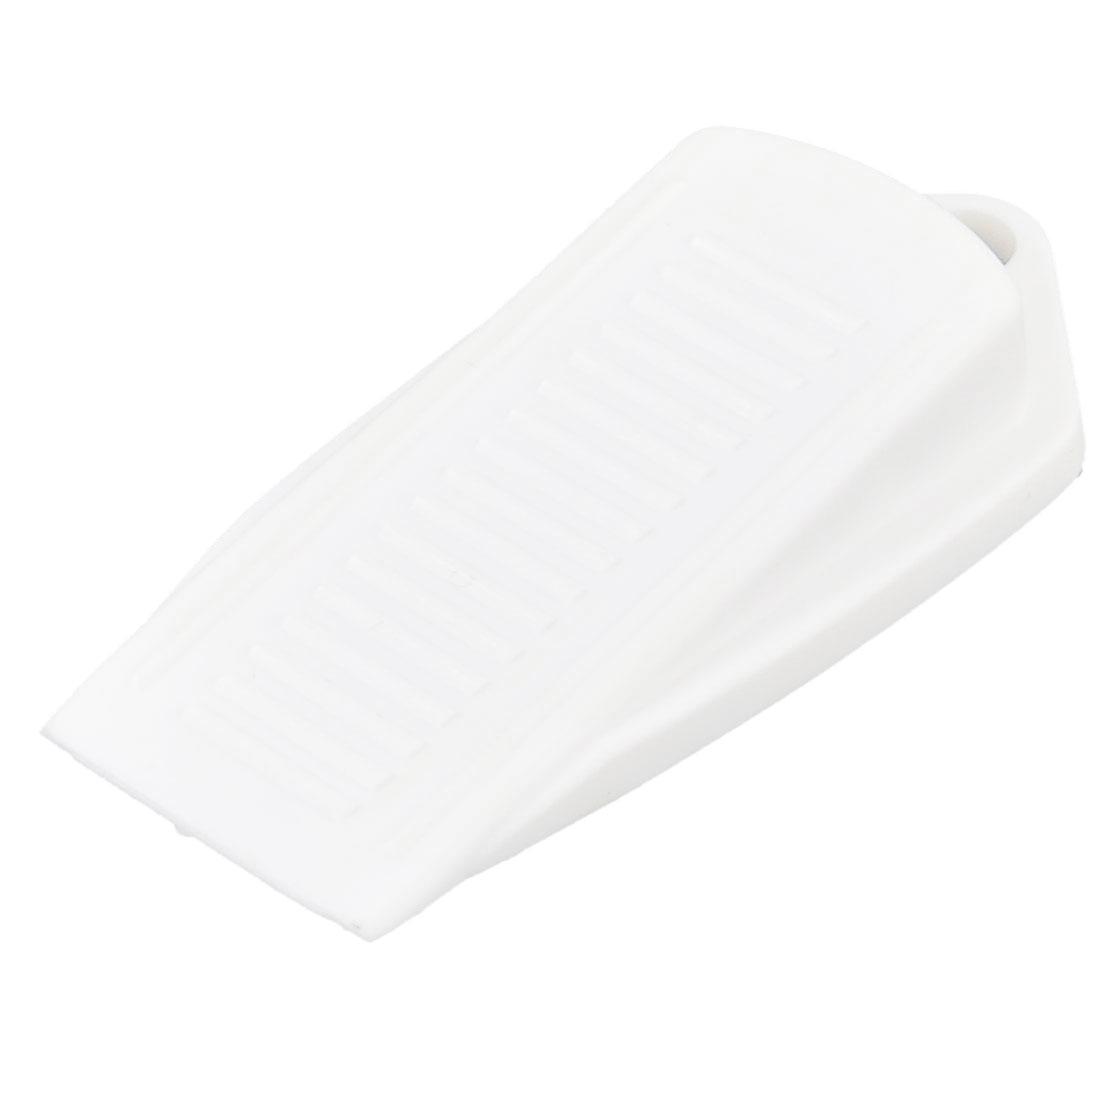 Rubber Doorstop Home Office Door Stop Wedge Safety Stopper White